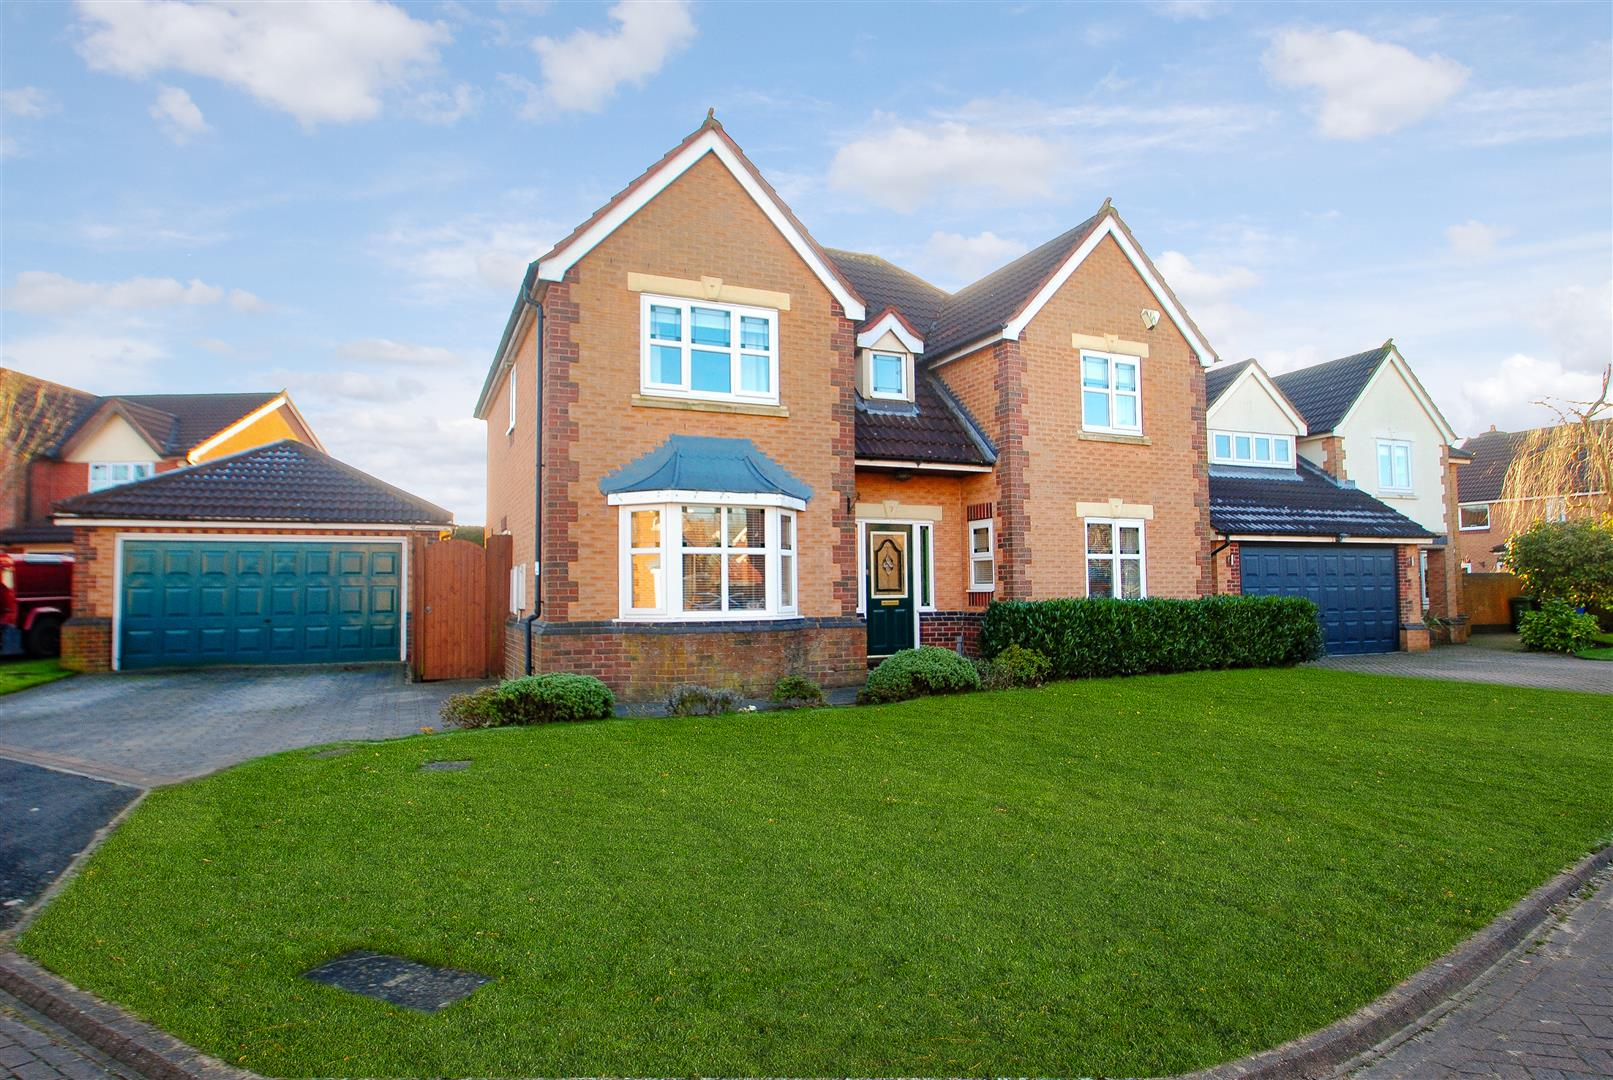 4 Bedrooms Detached House for sale in Westcliff Gardens, APPLETON, Warrington, WA4